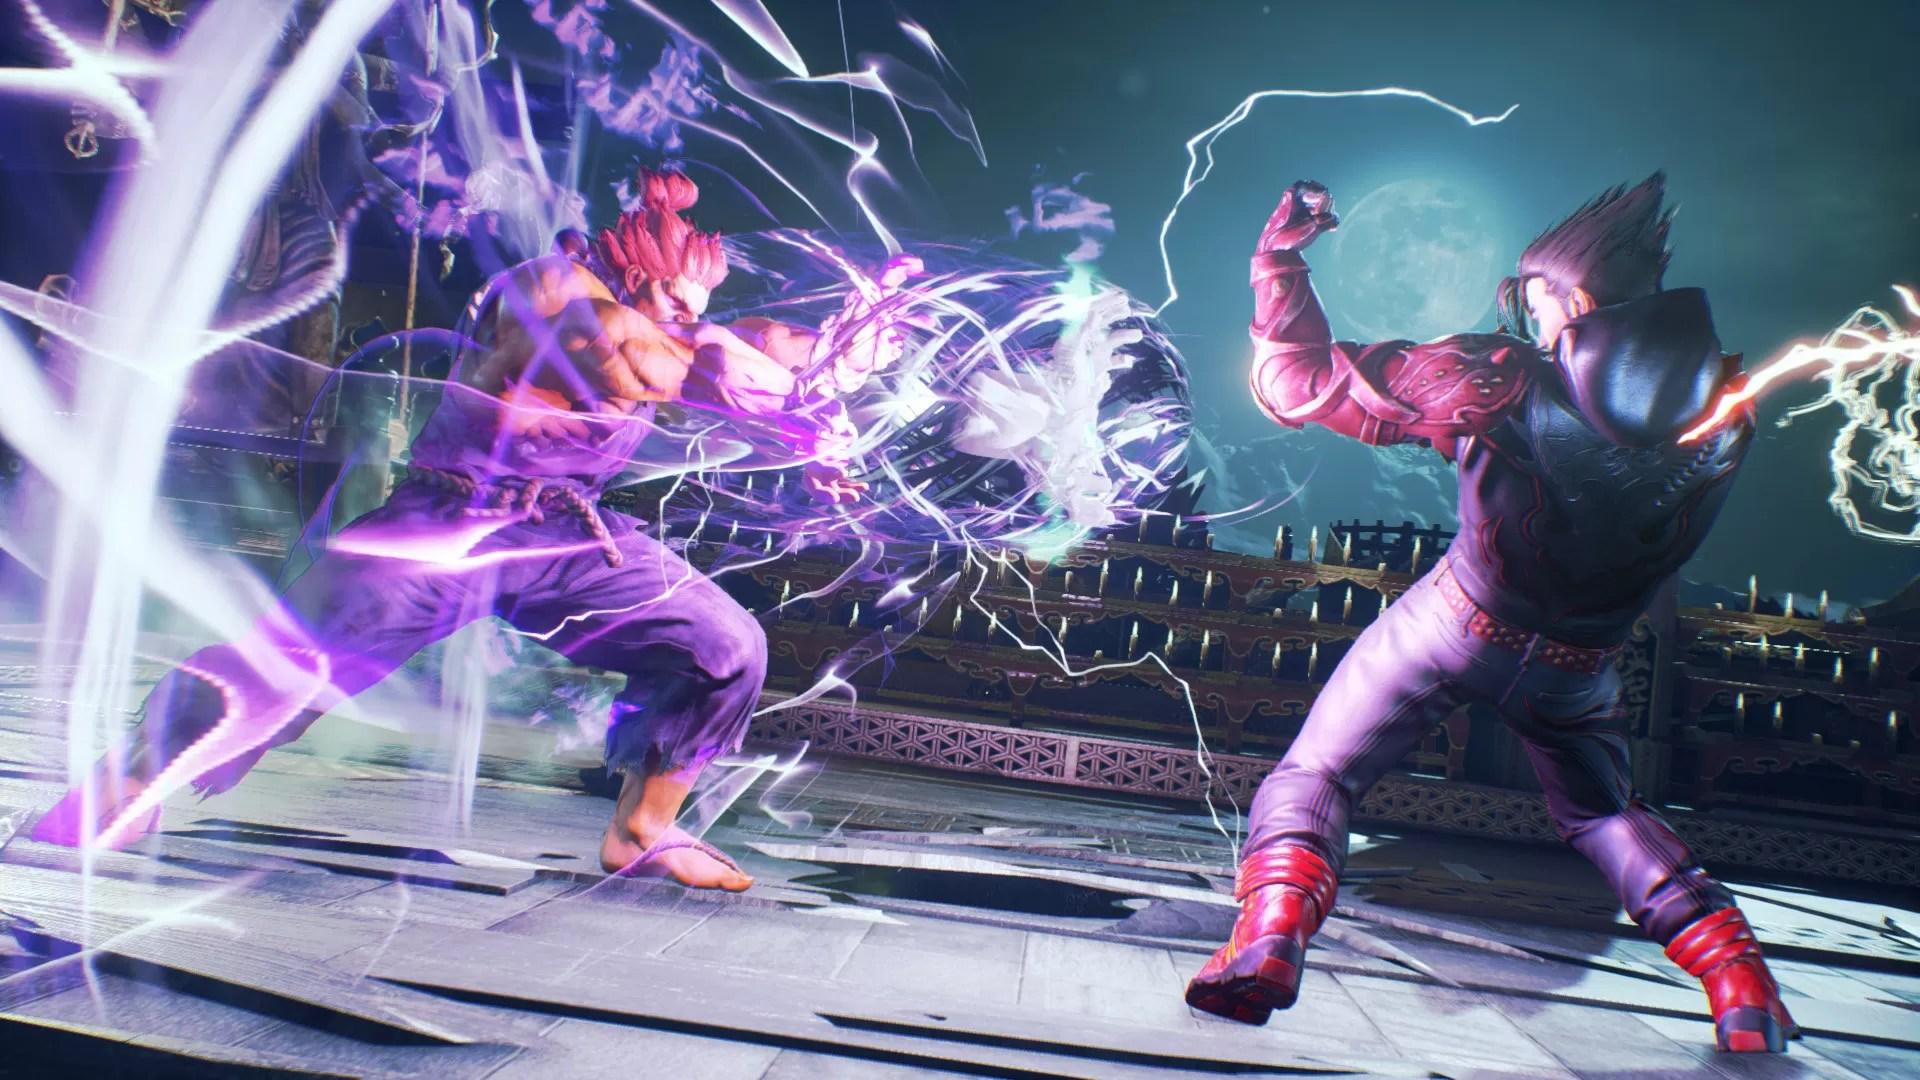 Nvidias Latest Graphics Drivers Are Optimized For Tekken